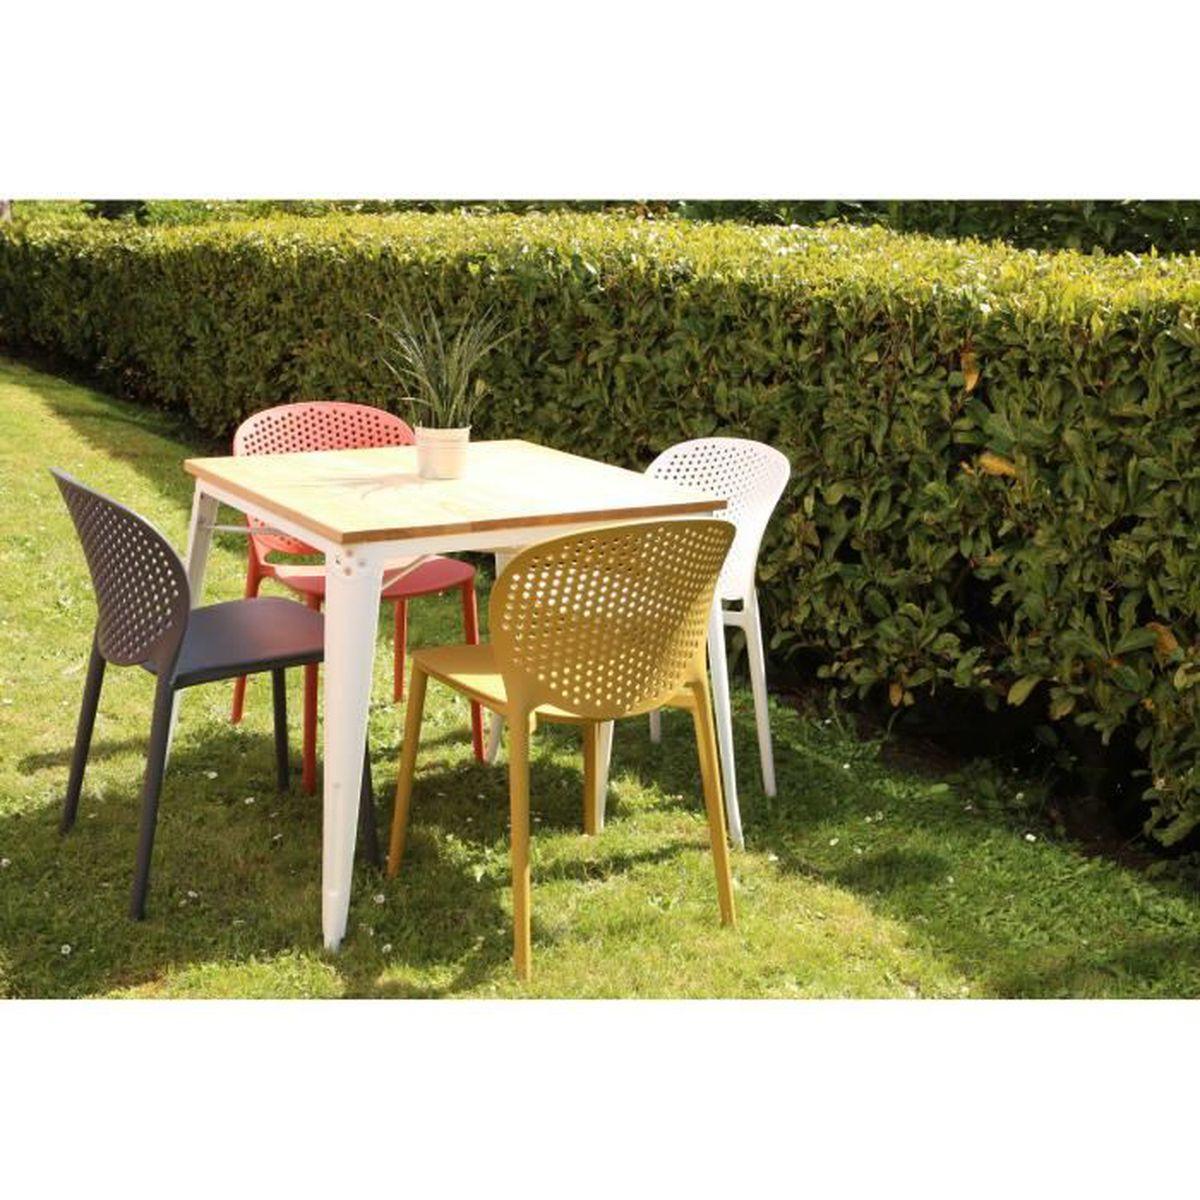 Jardin Sur Une Terrasse lots 4 chaises design jardin terrasse - achat / vente